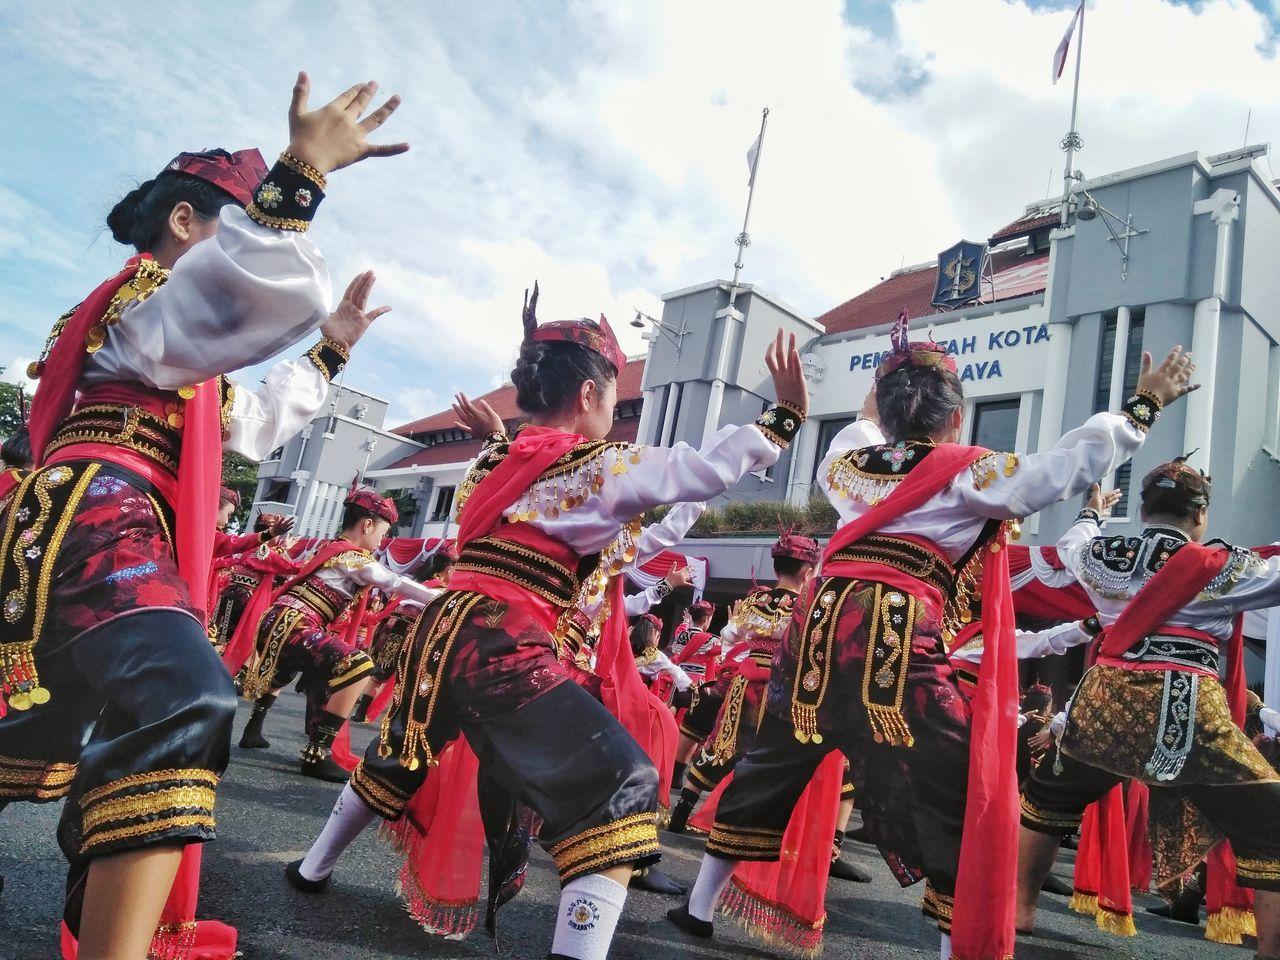 HBD SURABAYA 724 Celebration Dance Photography Traditional Festival Performance INDONESIA Dancers Streetphotograph Xiaomi